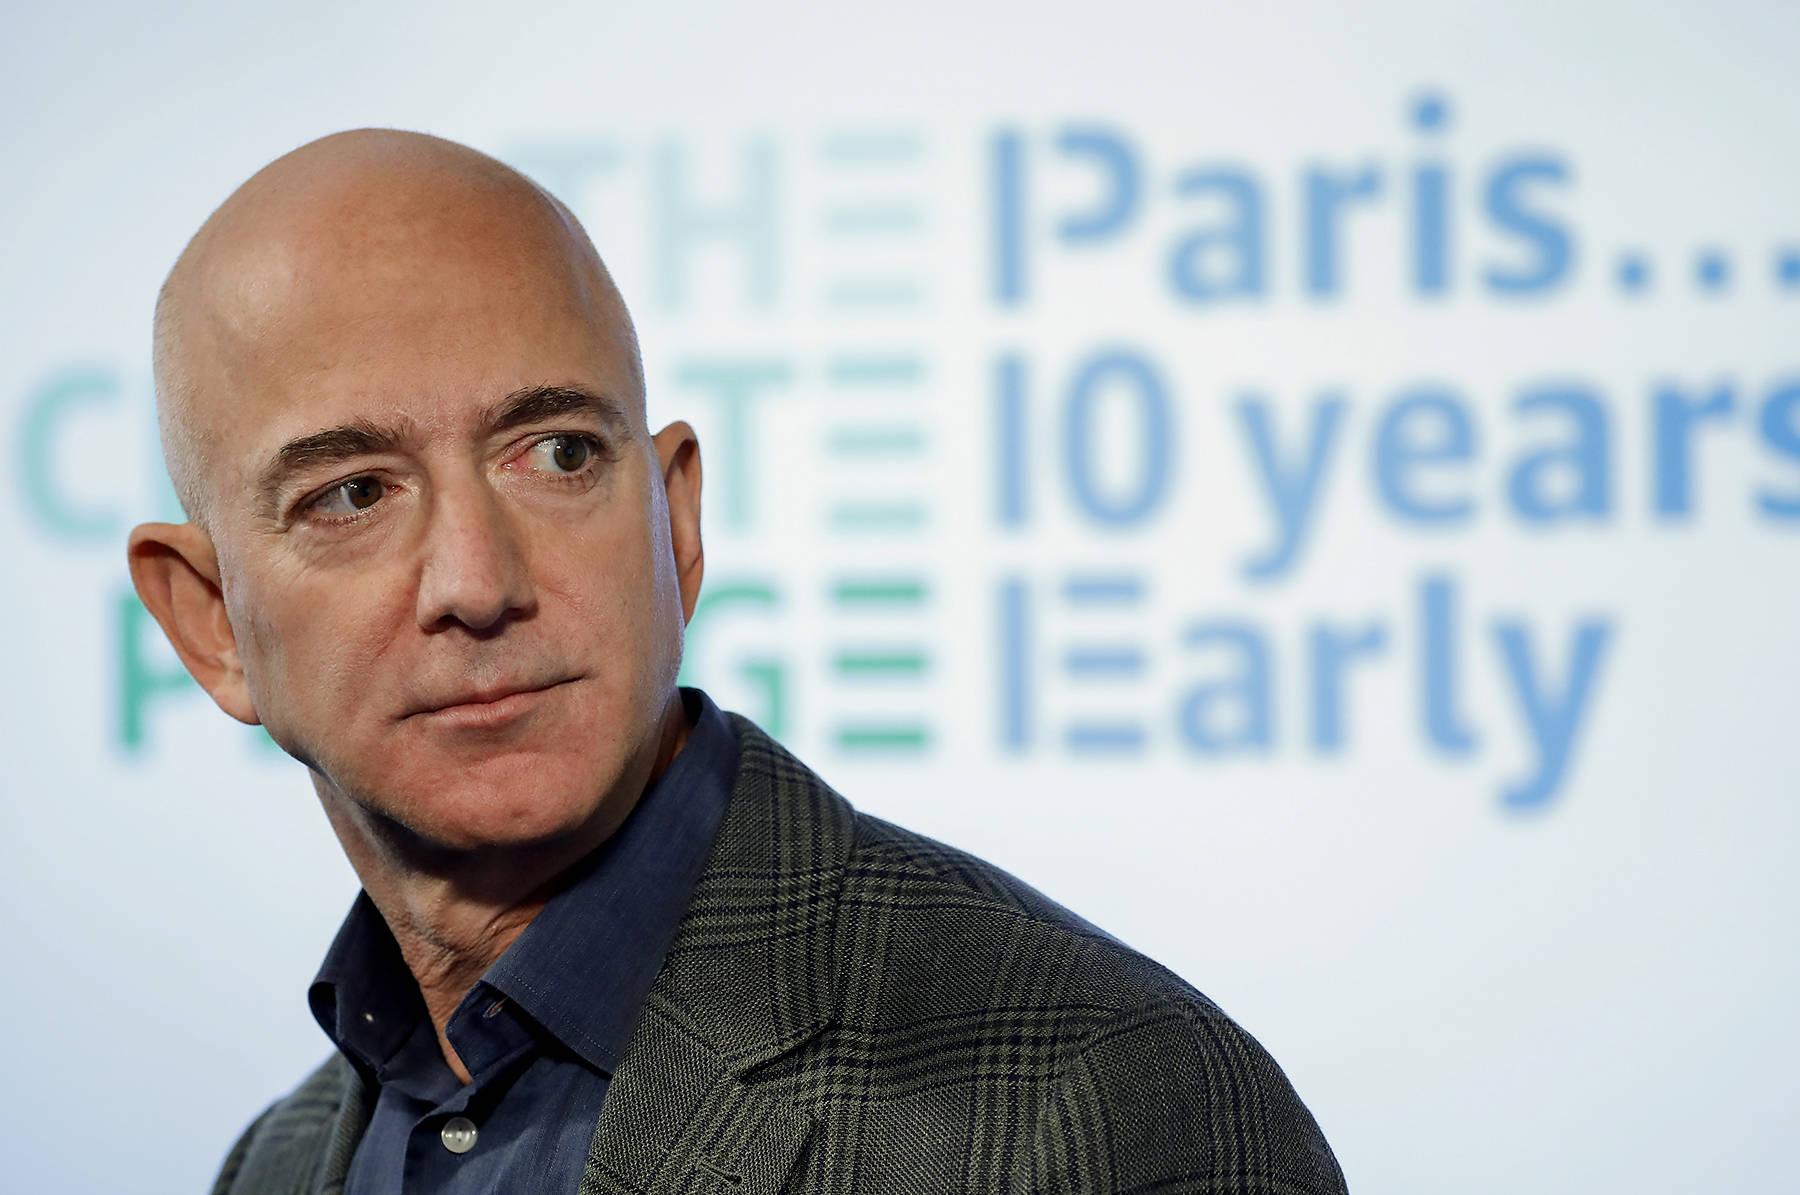 Amazon CEO Jeff Bezos speaks during his news conference at the National Press Club in Washington, Thursday, Sept. 19, 2019. (AP Photo/Pablo Martinez Monsivais)